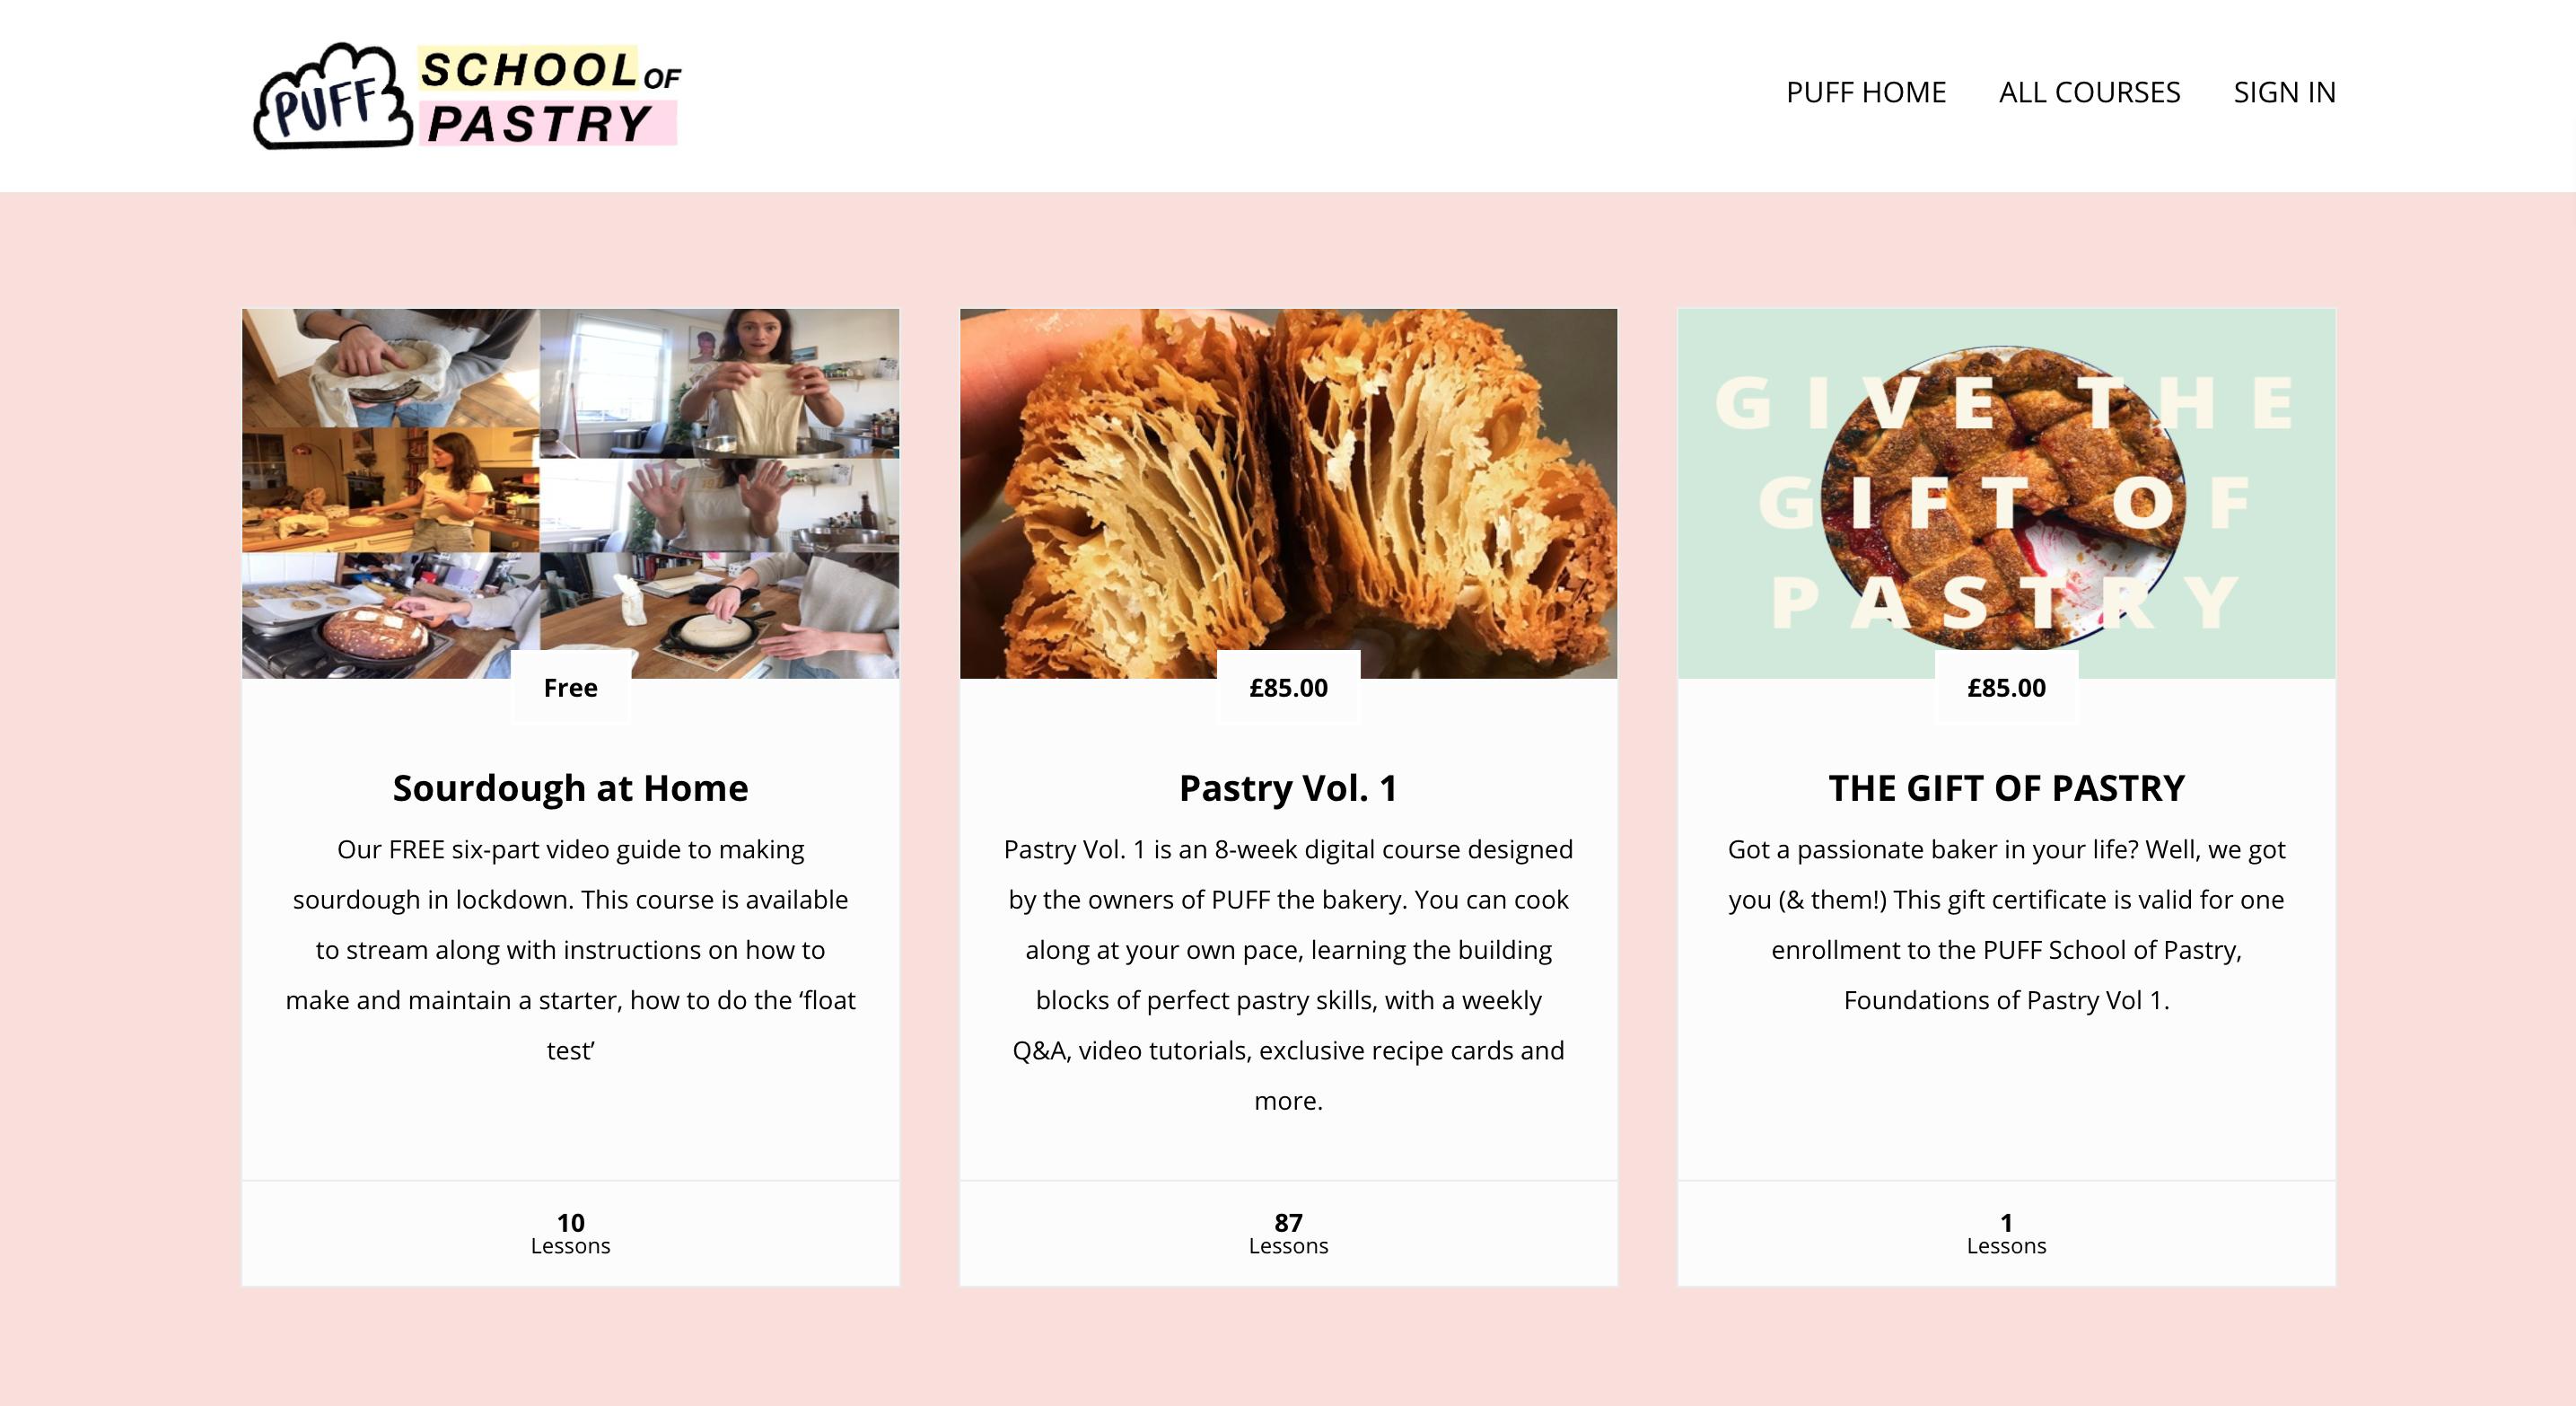 PUFF School of Pastry